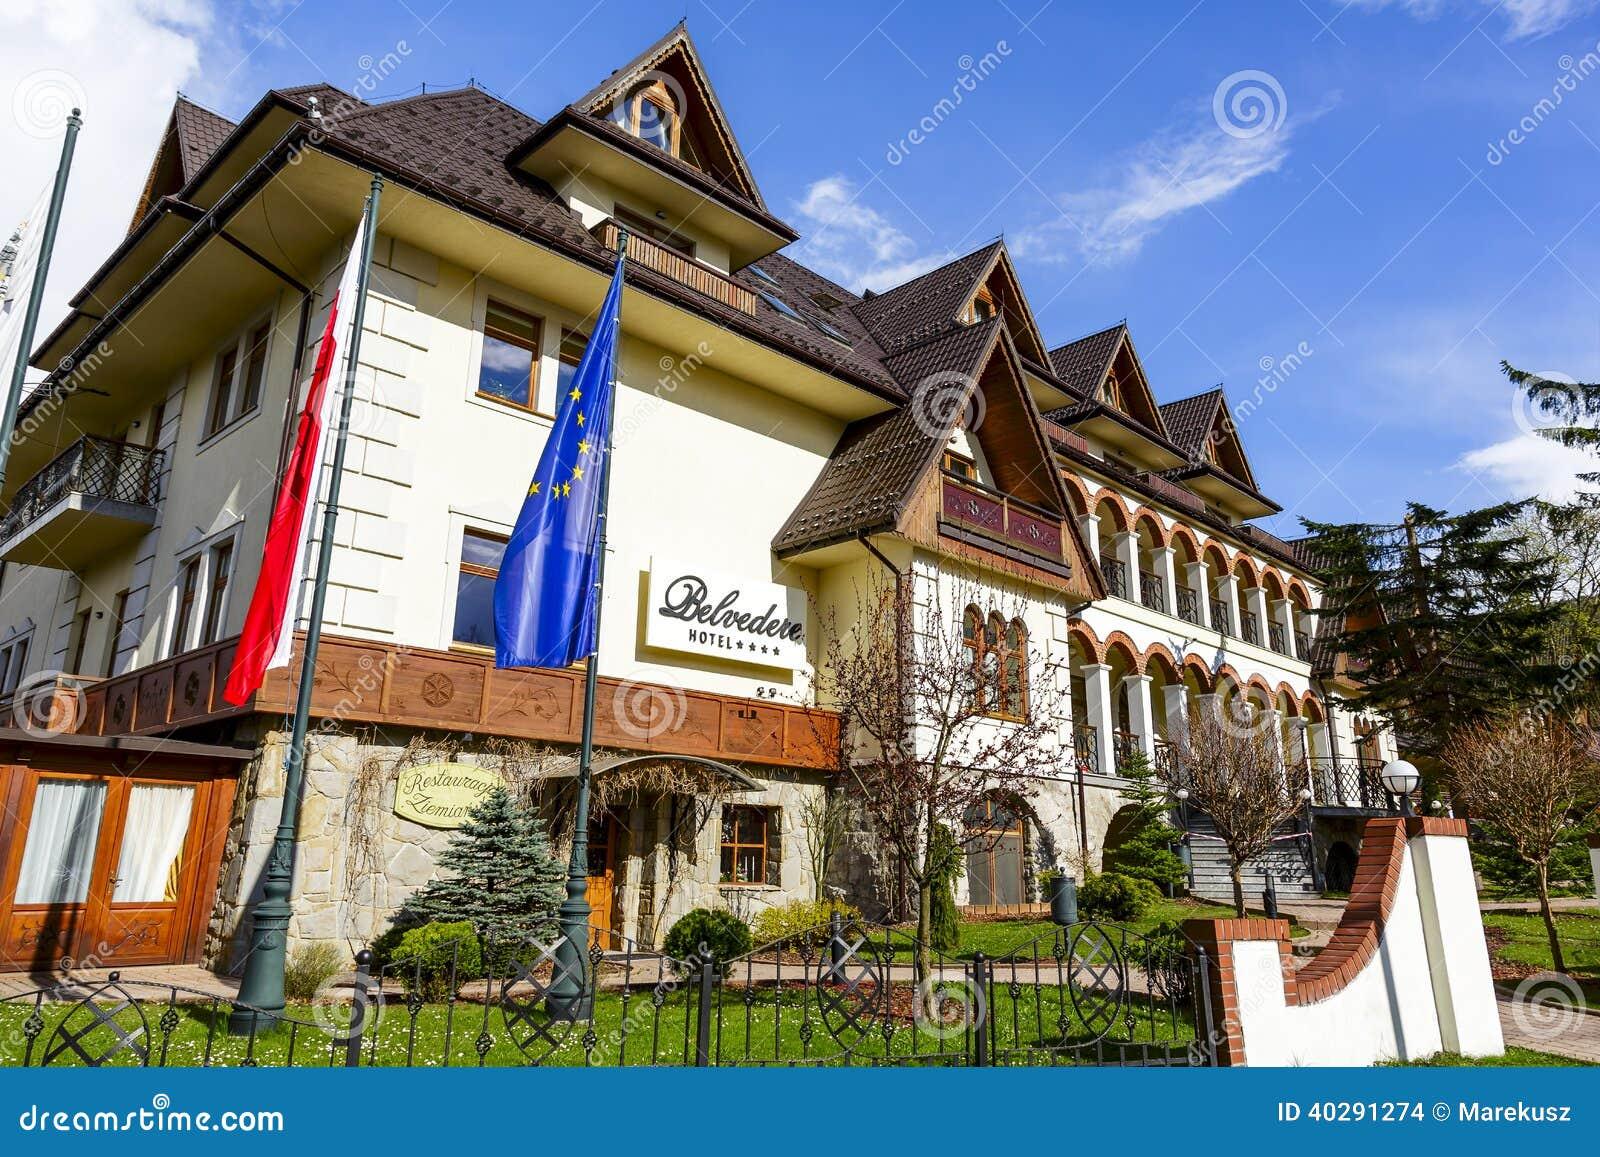 Гостиница бельведера в Zakopane